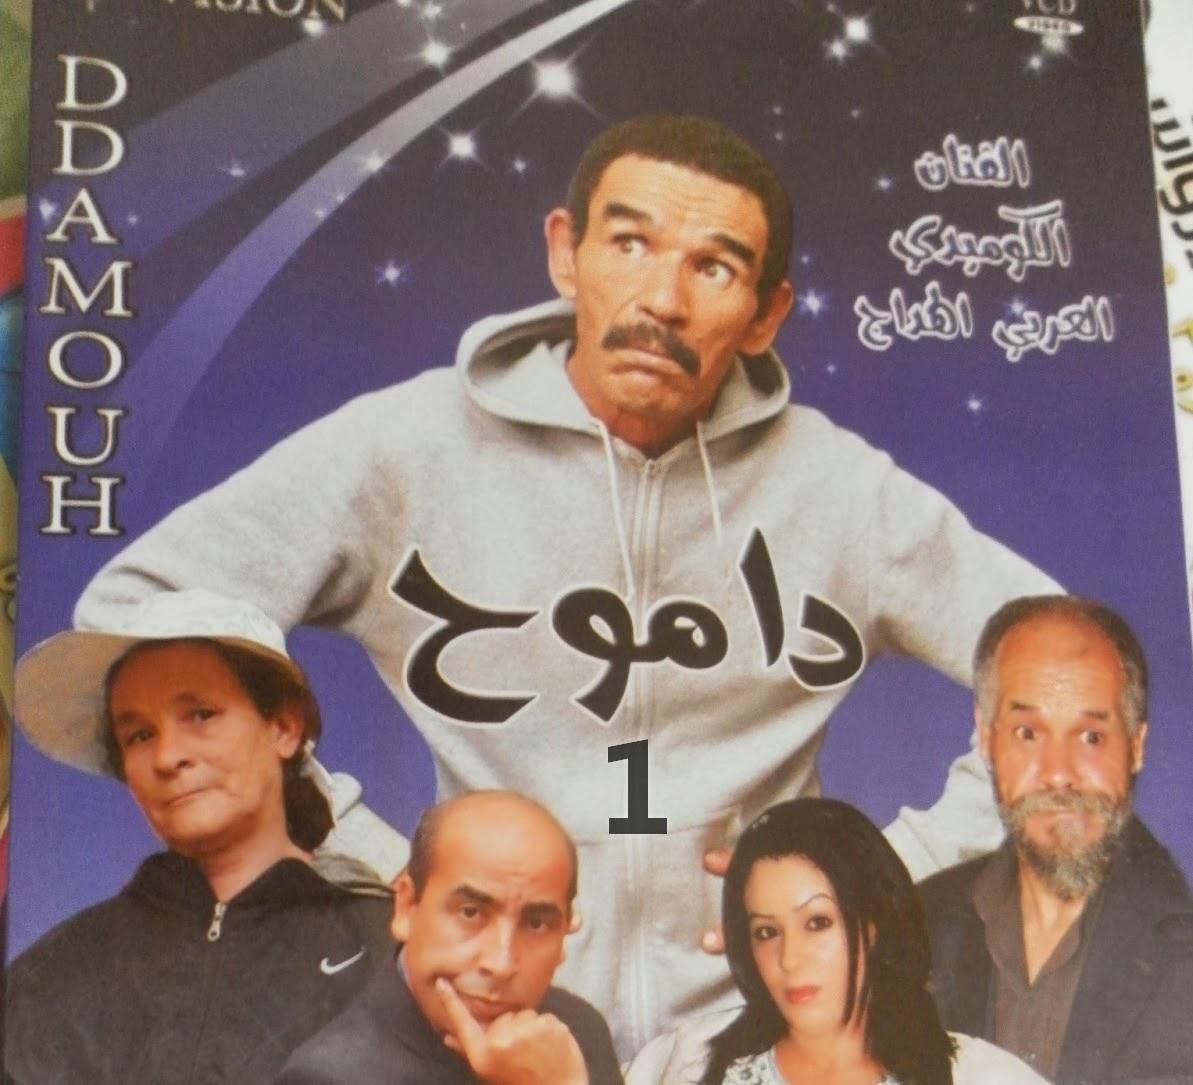 film damouh